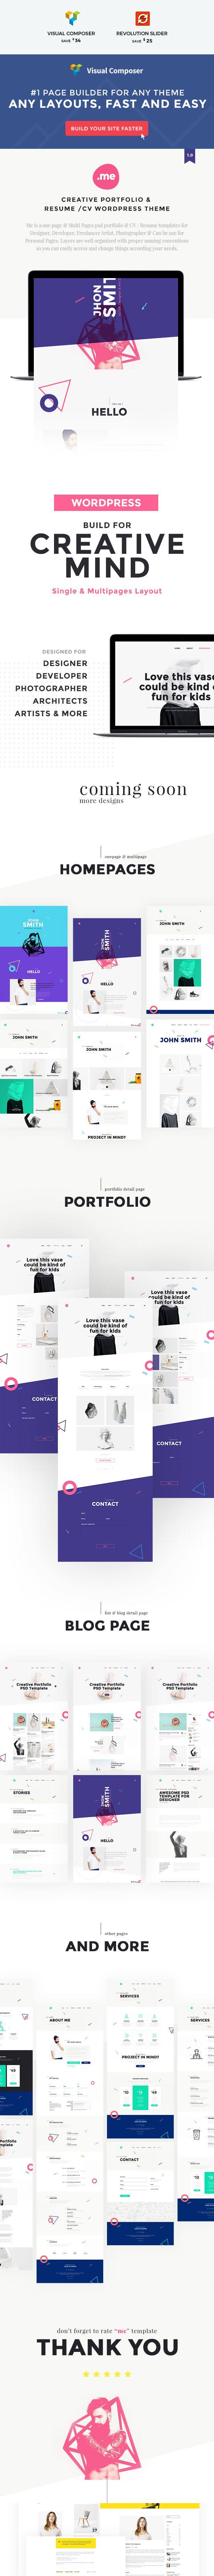 Creative Portfolio & Resume / CV WordPress Theme